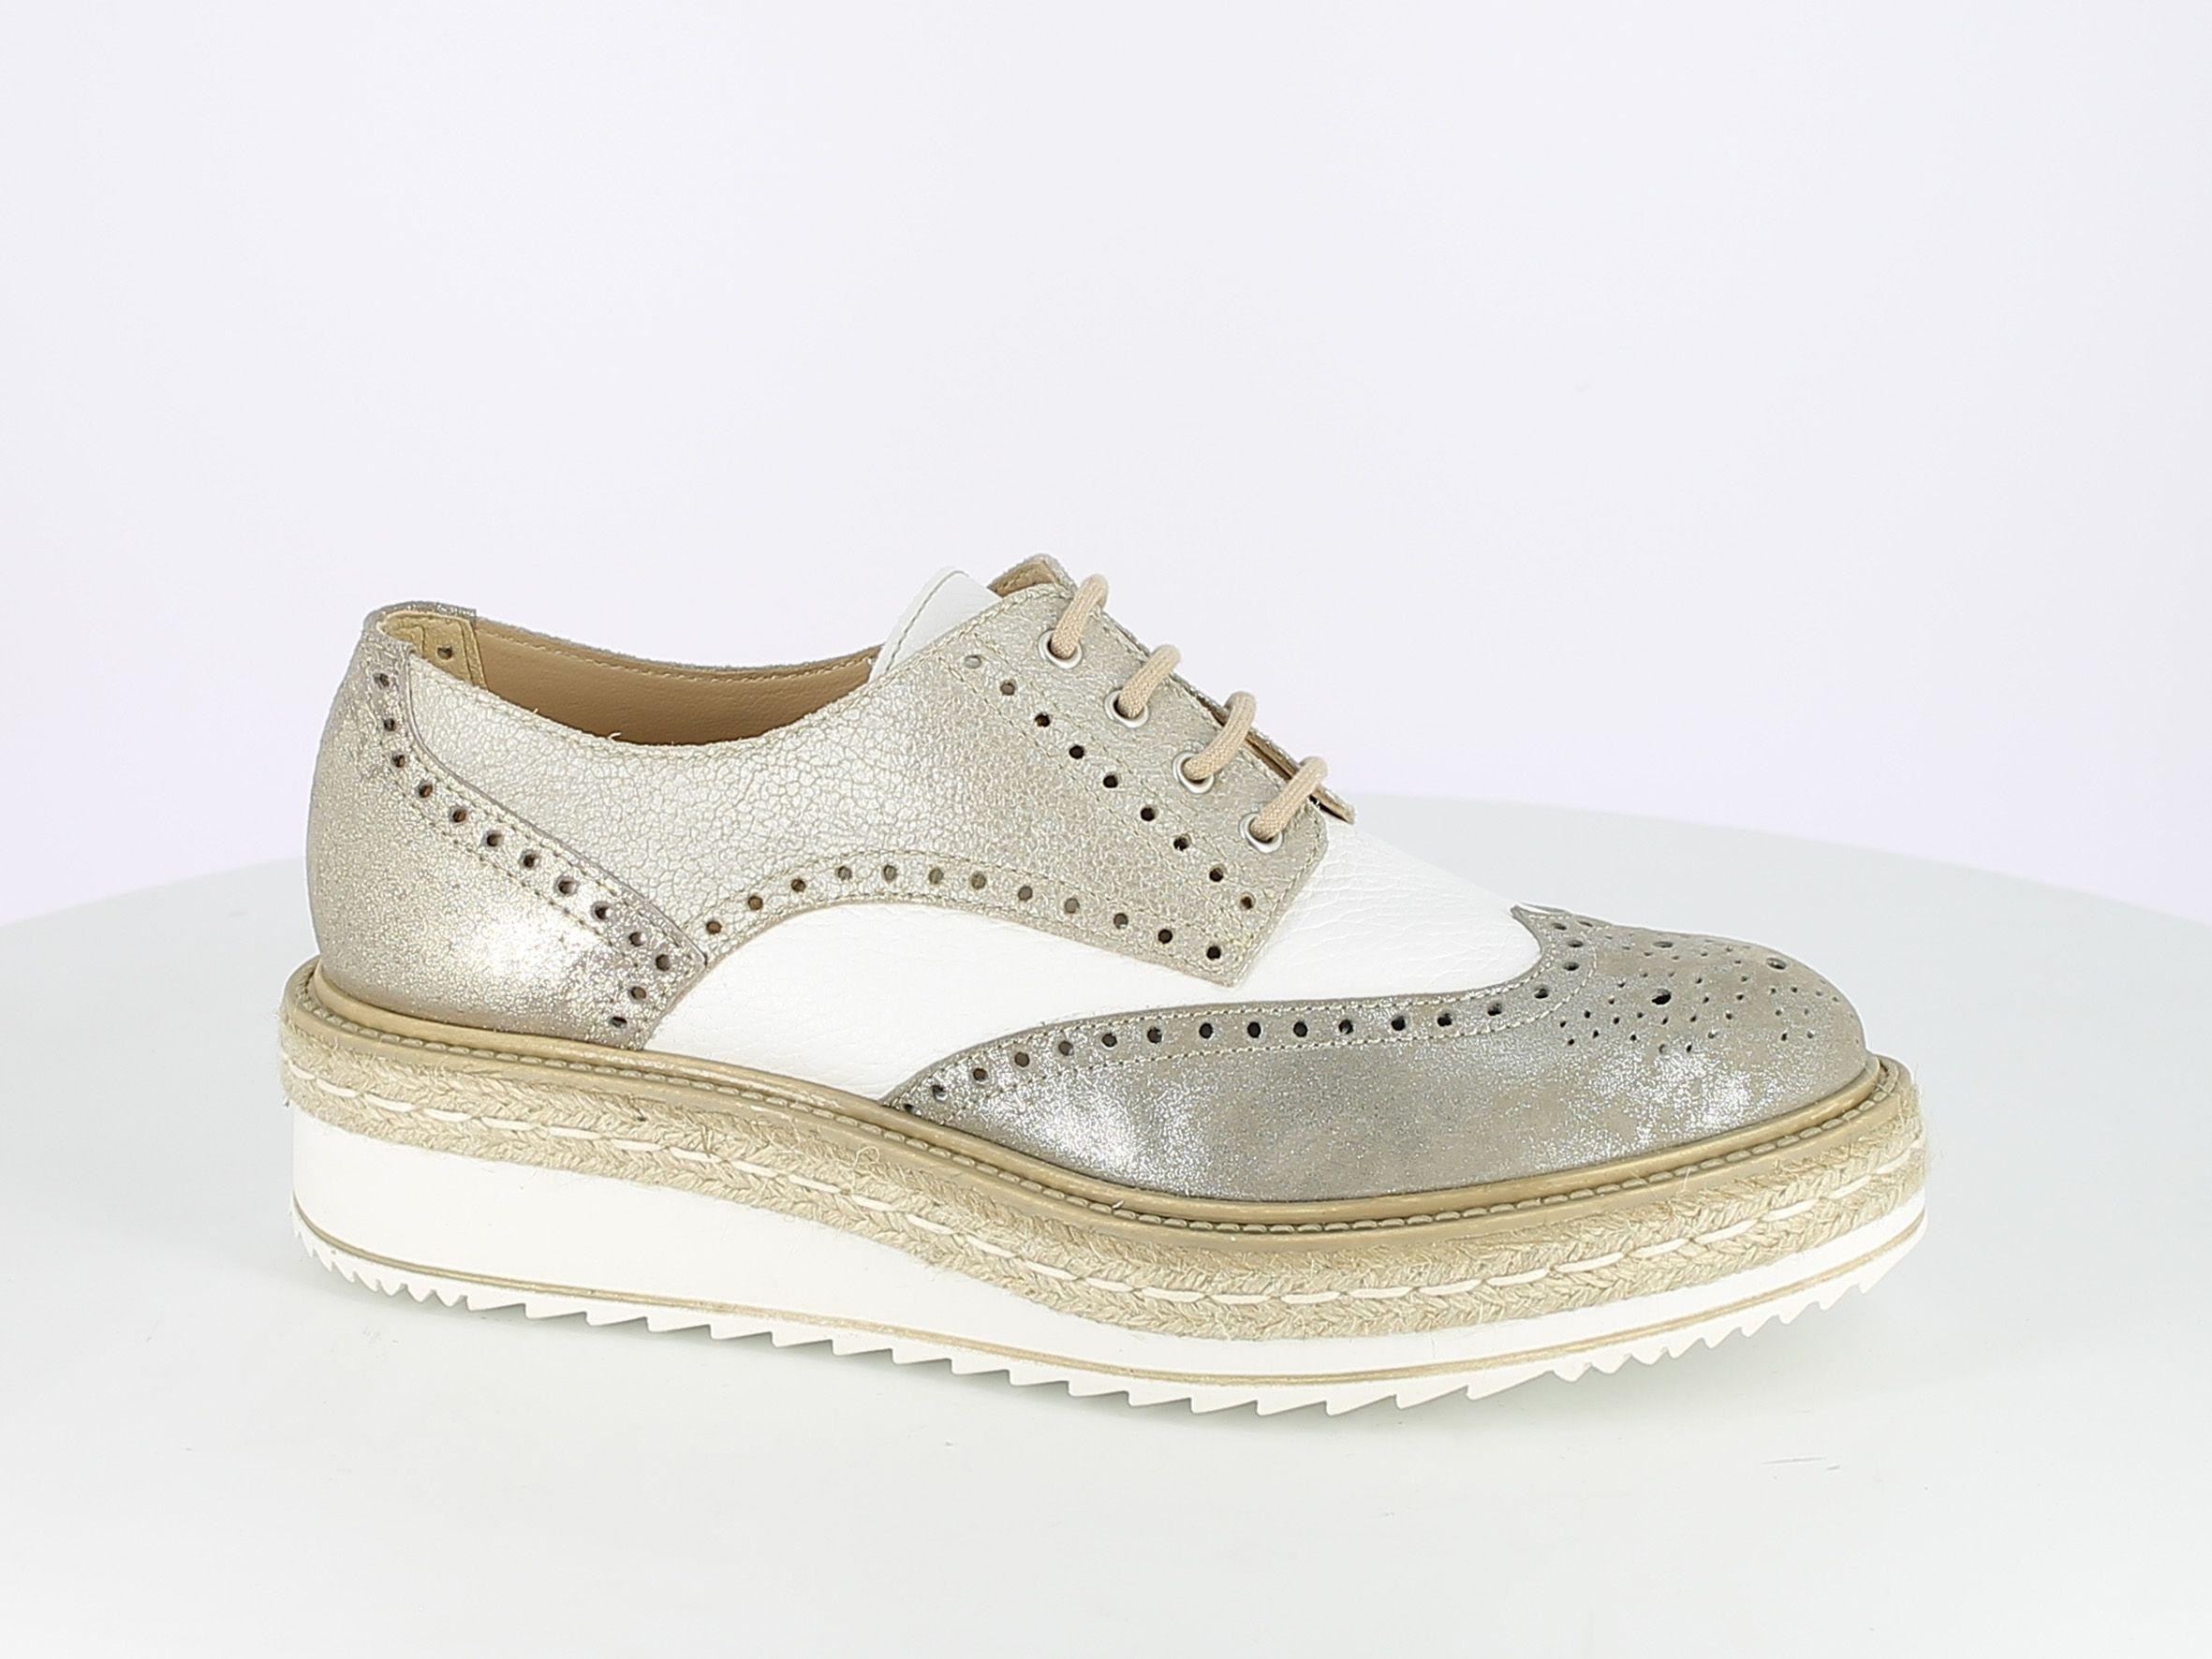 Nickels Ladies Shoe Boots